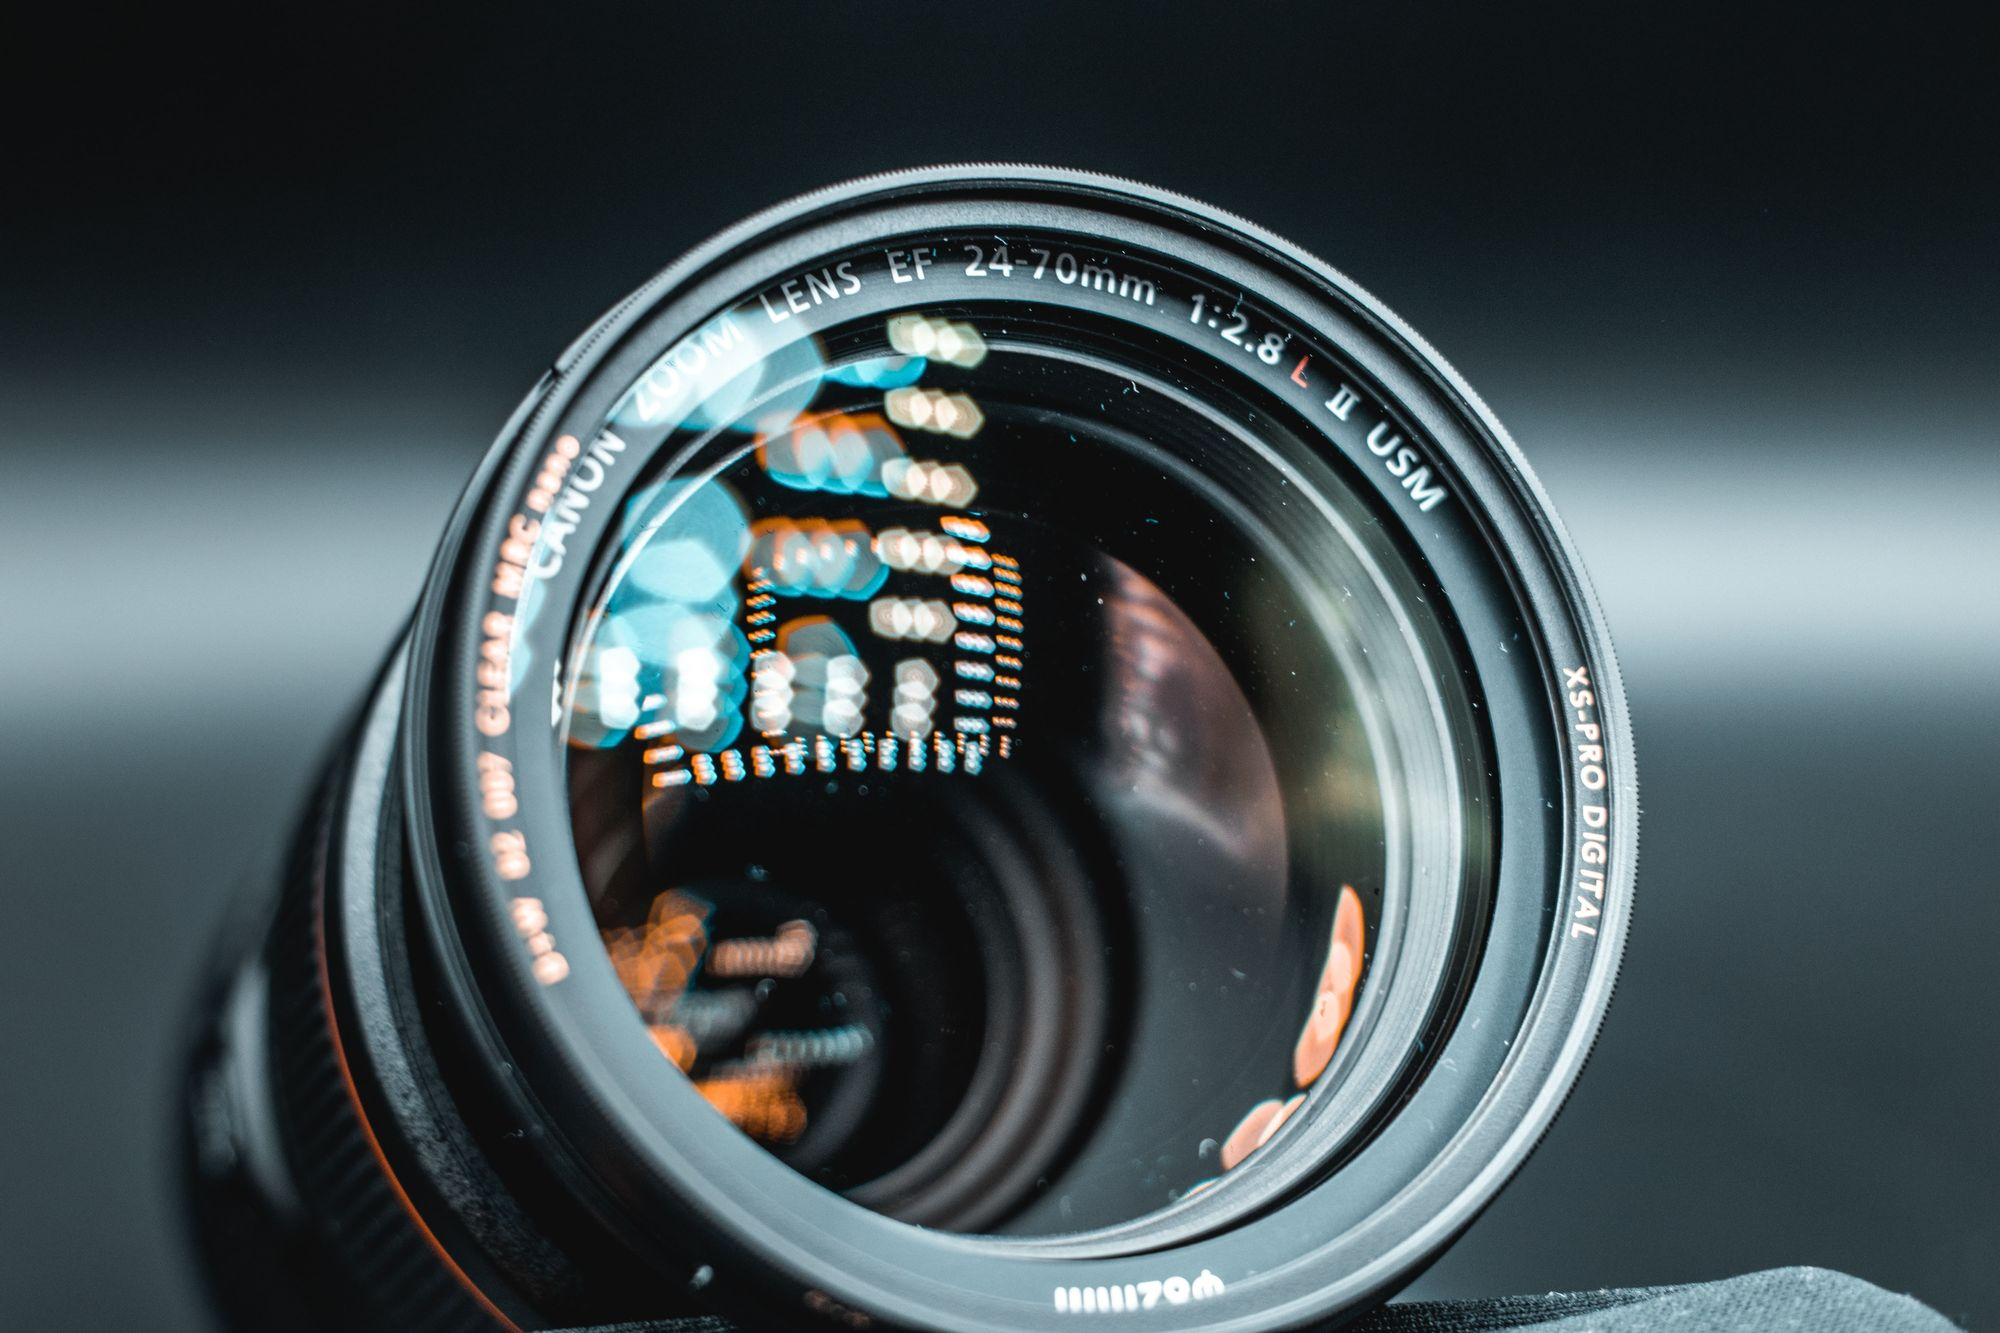 Best lens for landscape the Canon EF 24-70mm